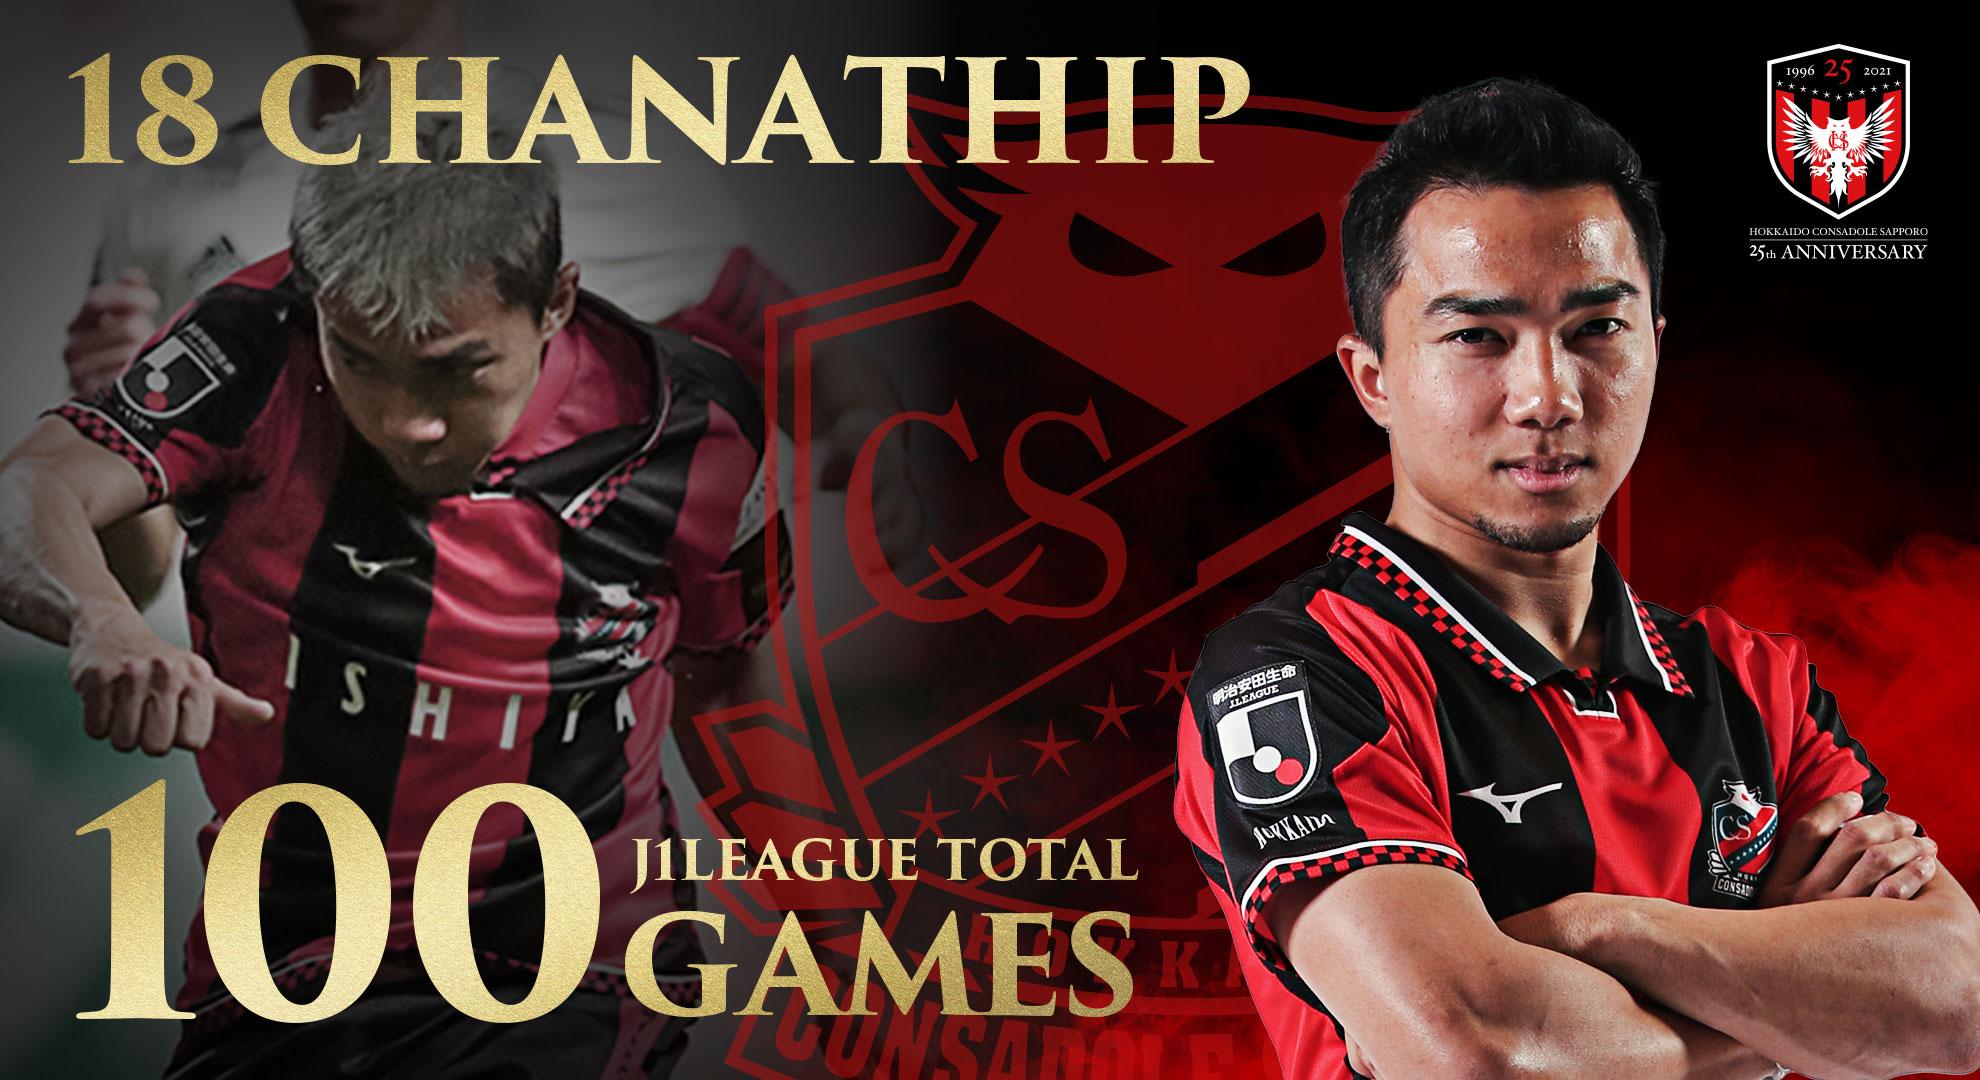 Penyelenggara J-League 1 memposting foto untuk memberi selamat kepada Chanathip atas permainannya yang ke-100 di turnamen ini.